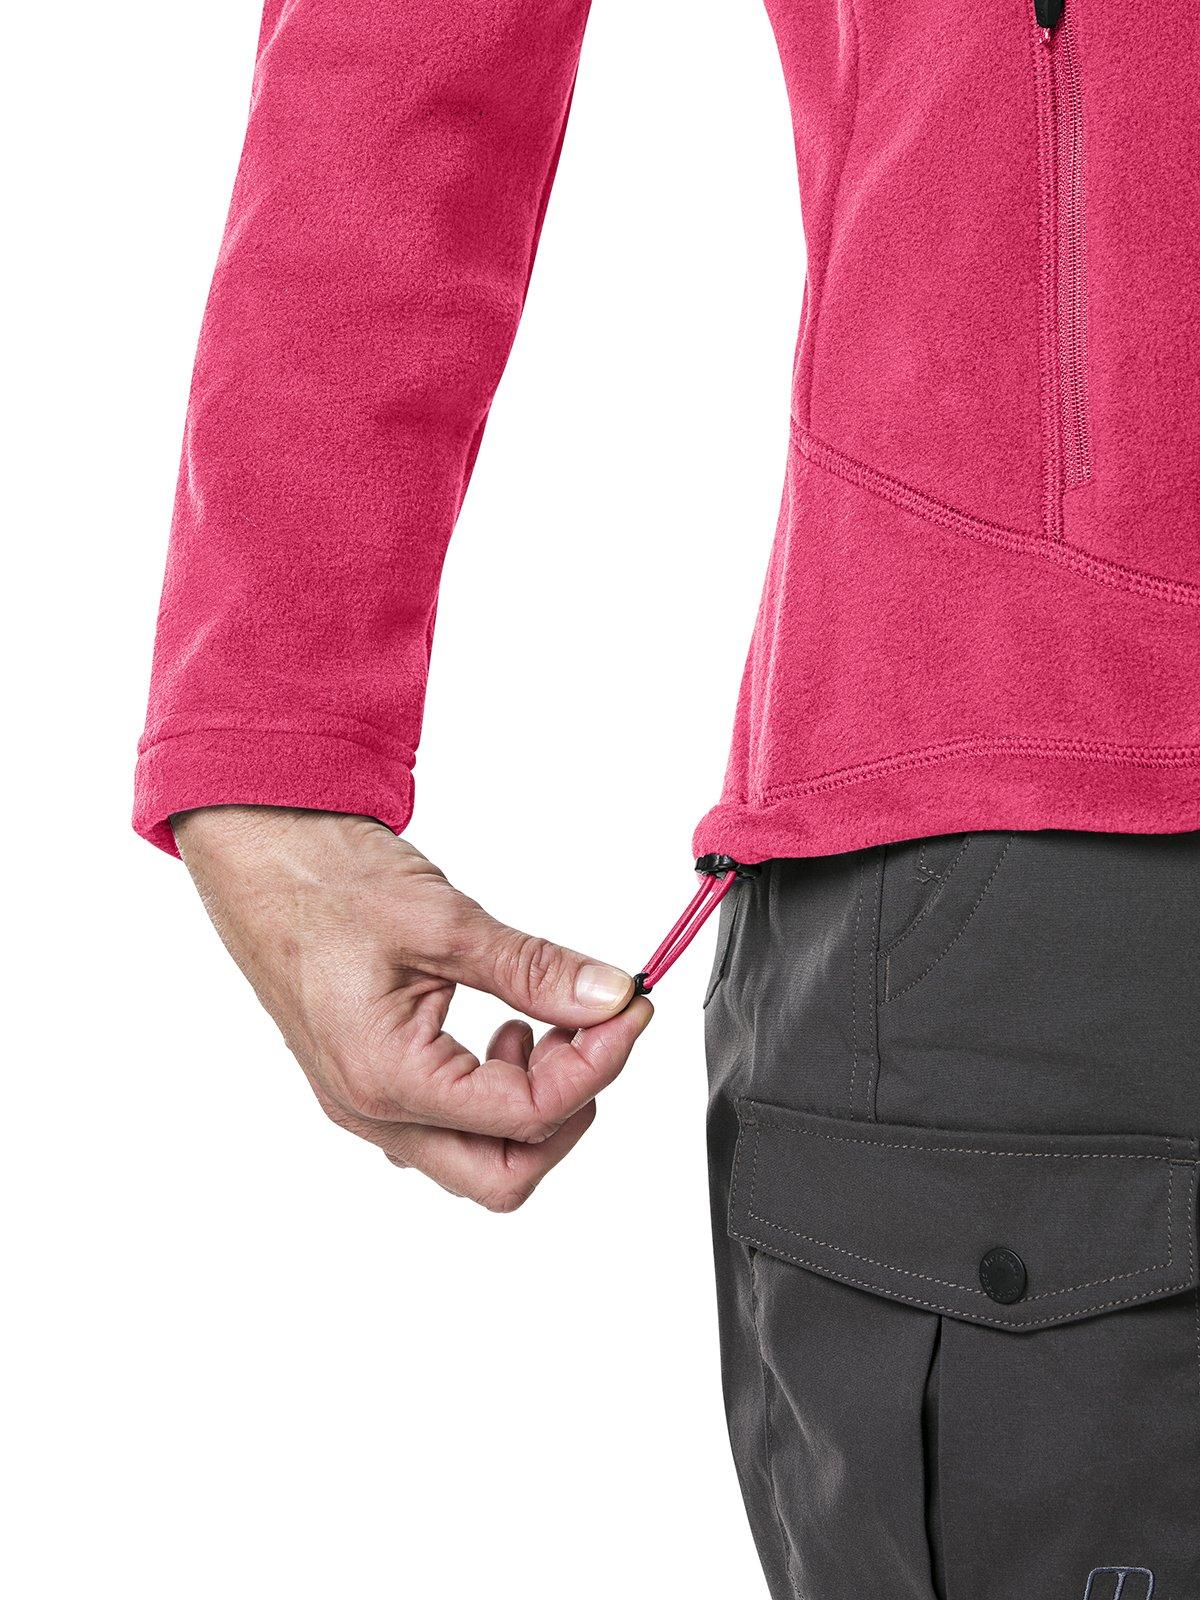 81zeXIh XUL - Berghaus Prism 2.0 Women's Fleece Jacket